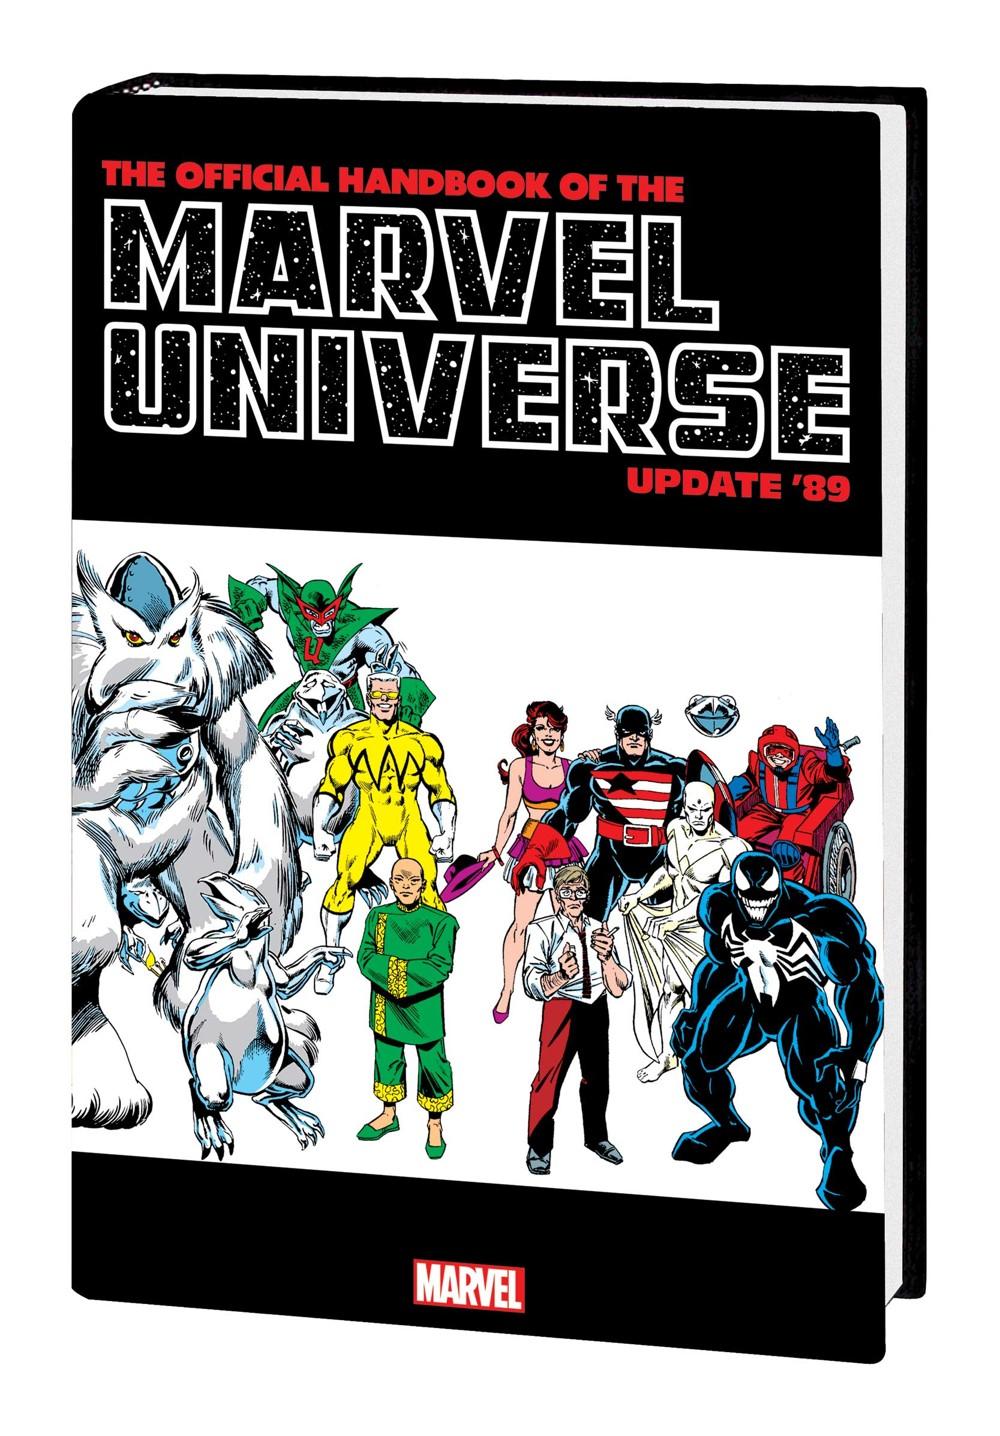 OHOTMU1989OMNIHC_dstjkt Marvel Comics December 2021 Solicitations